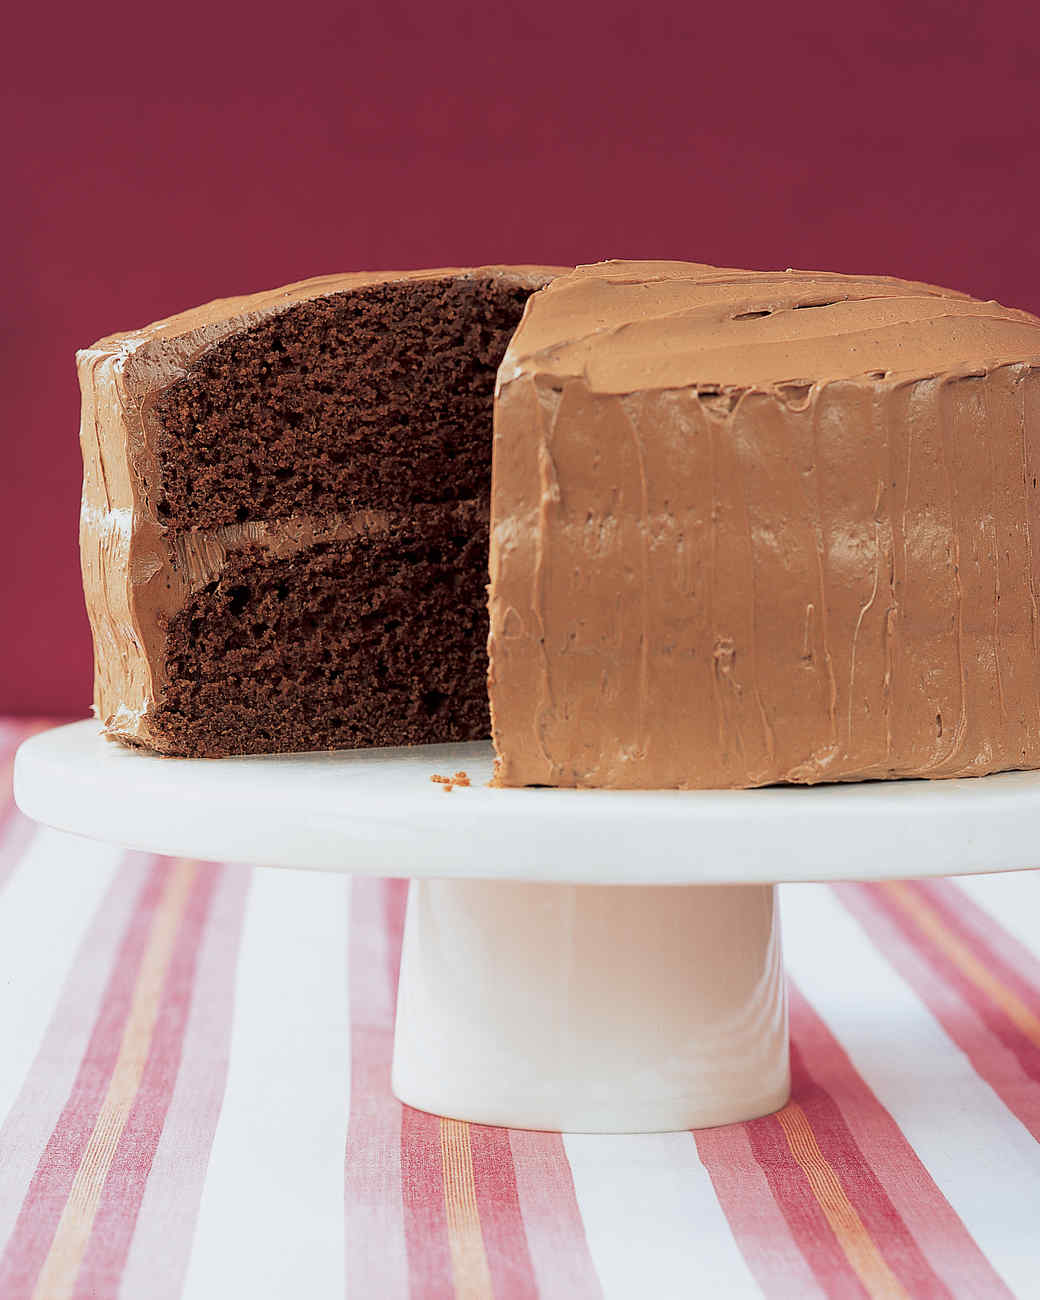 msledf_0503_cocoa_cake.jpg